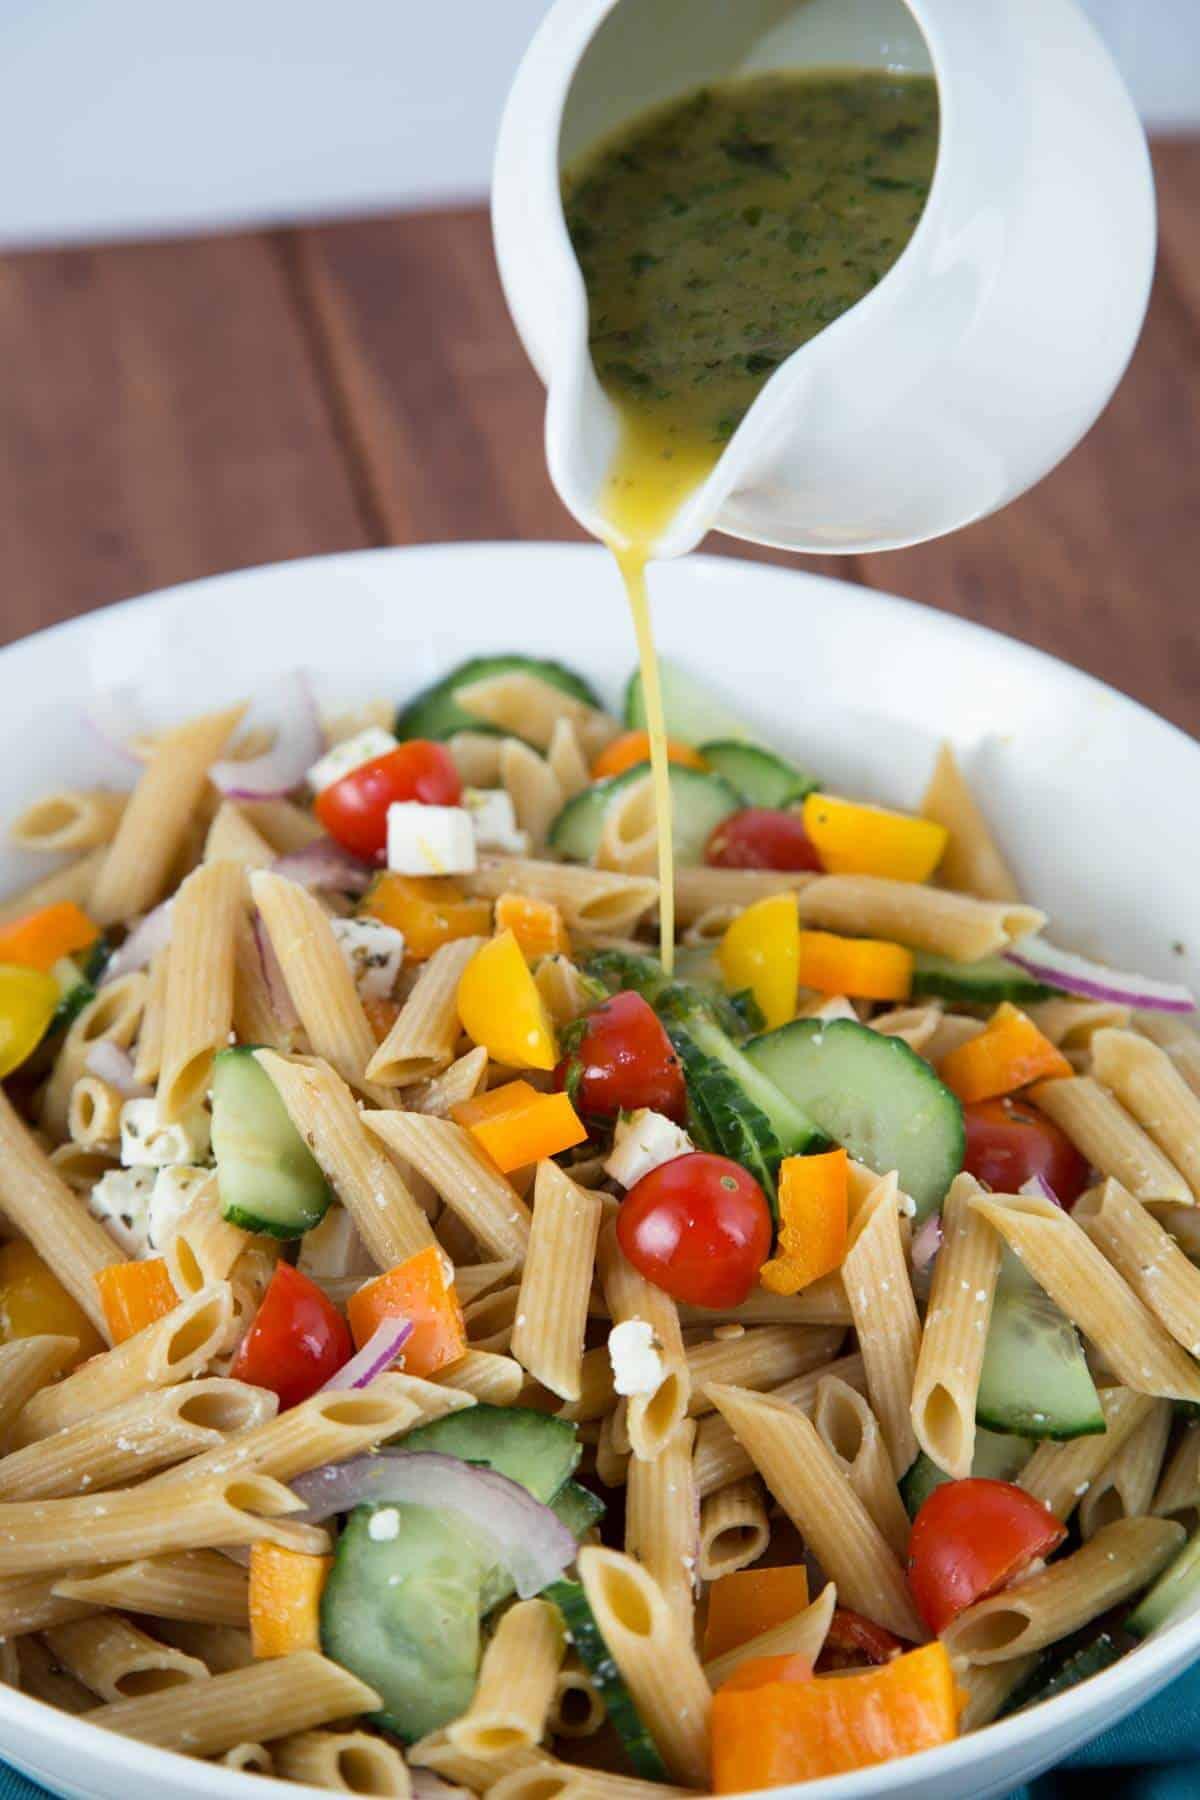 Mixing homemade dressing onto delicious pasta salad | jessicagavin.com